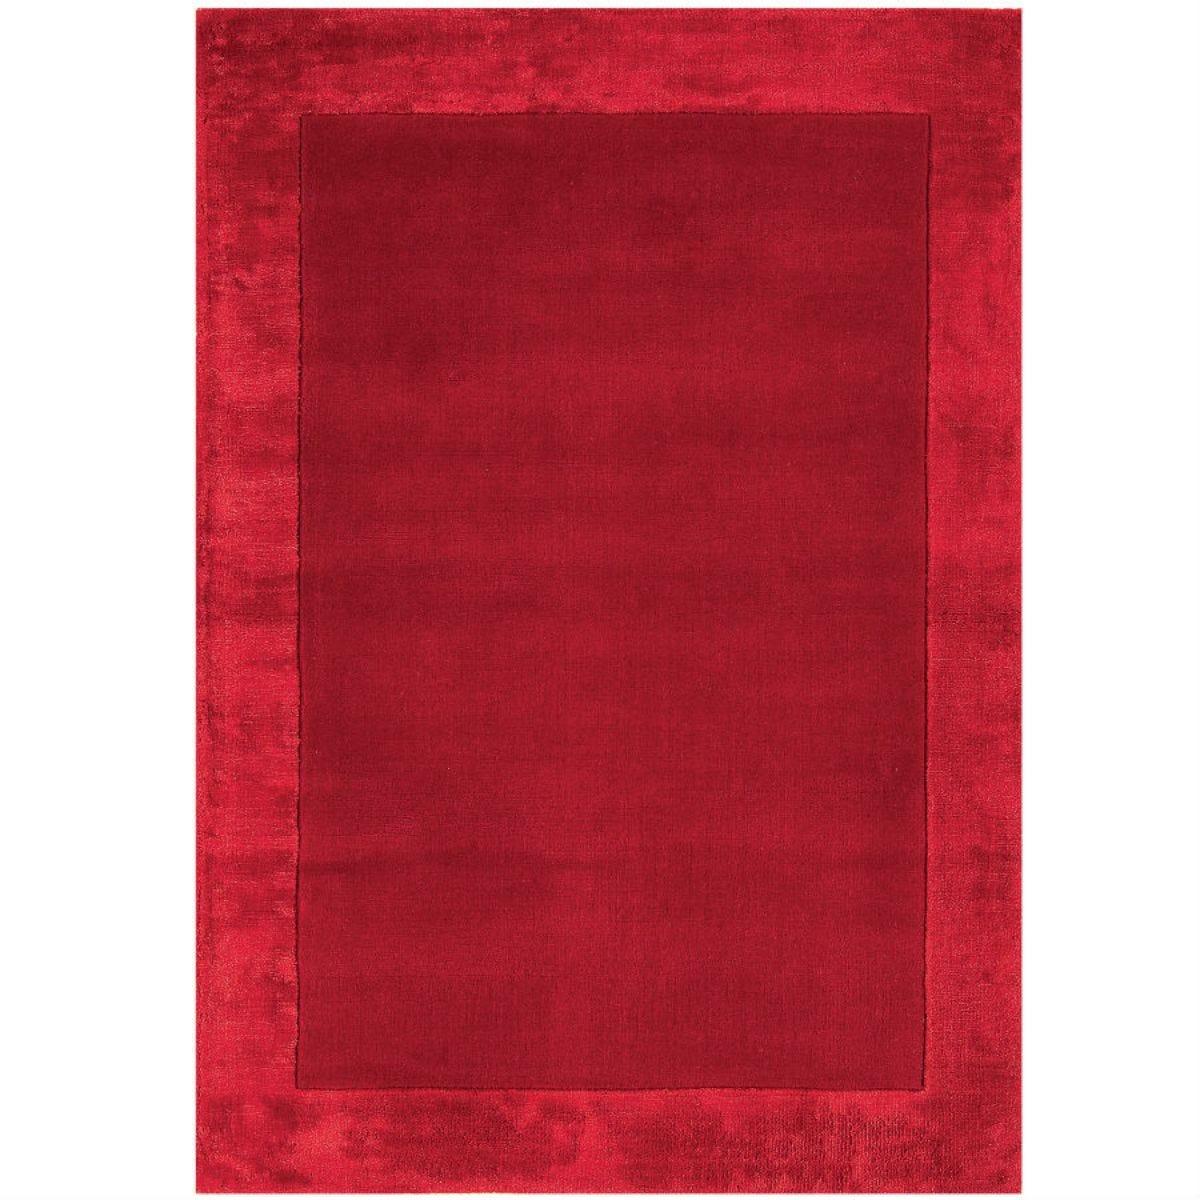 Asiatic Ascot Rug, 200 x 290cm - Red